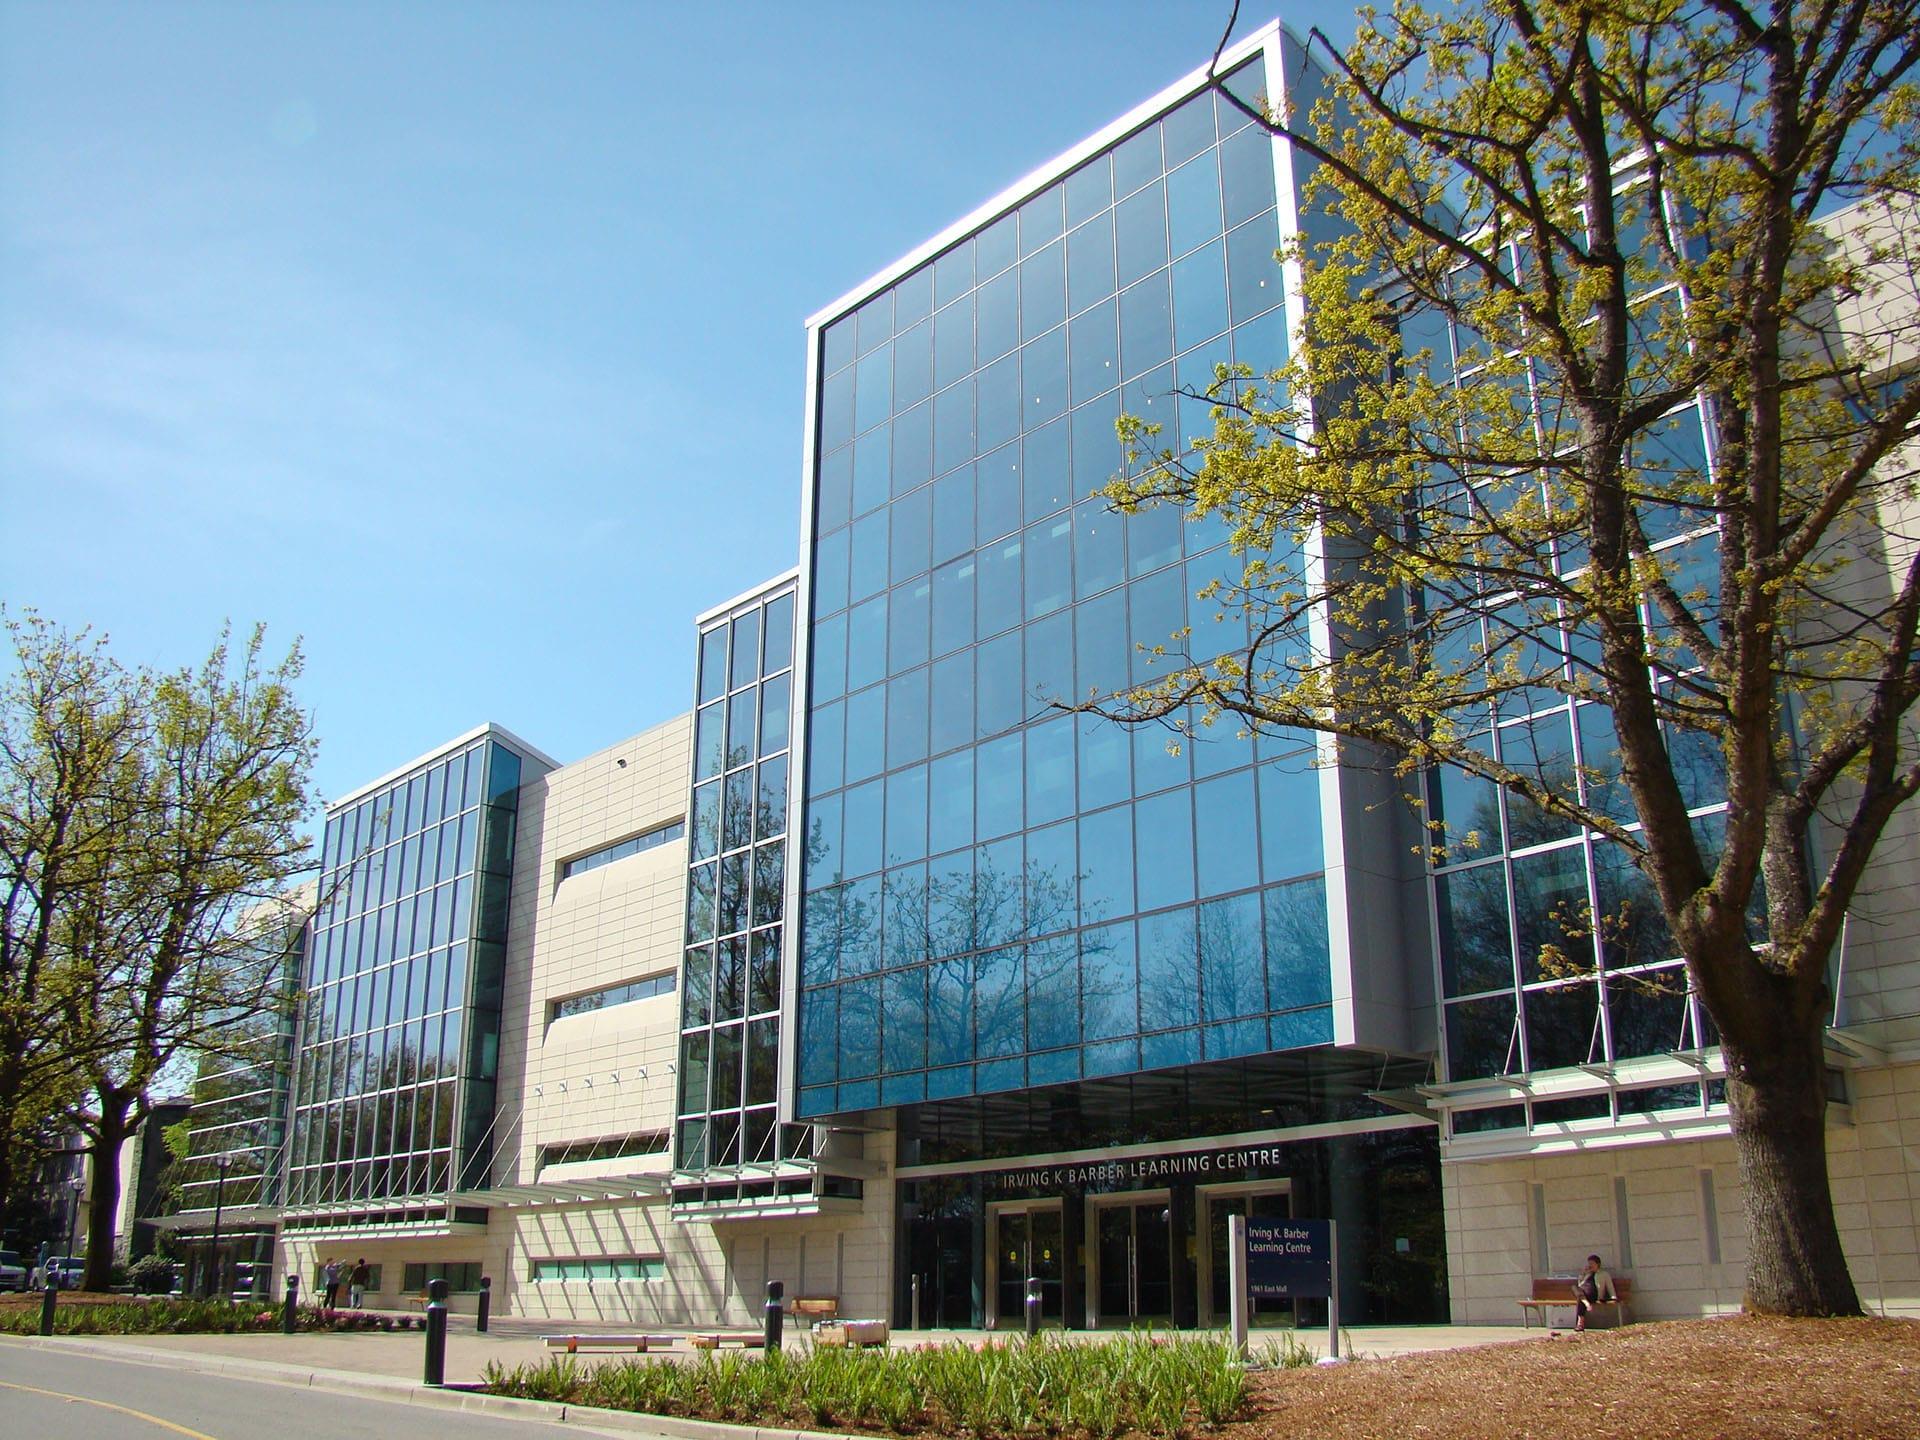 IKBLC Building